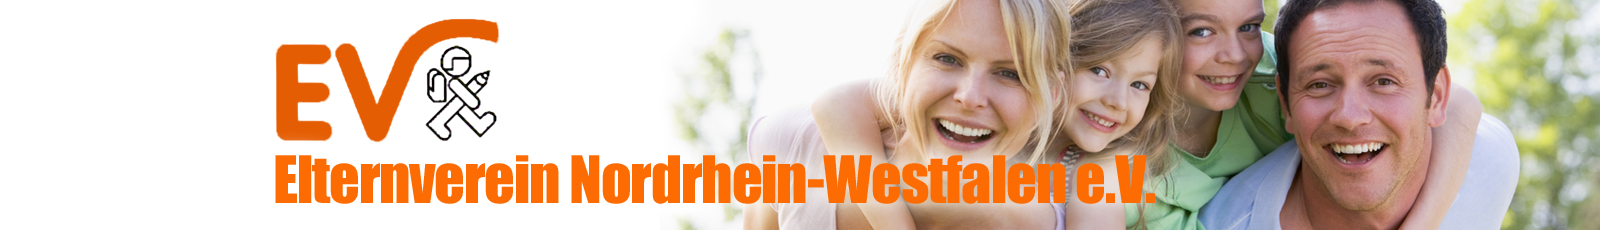 Elternverein Nordrhein-Westfalen e.V.